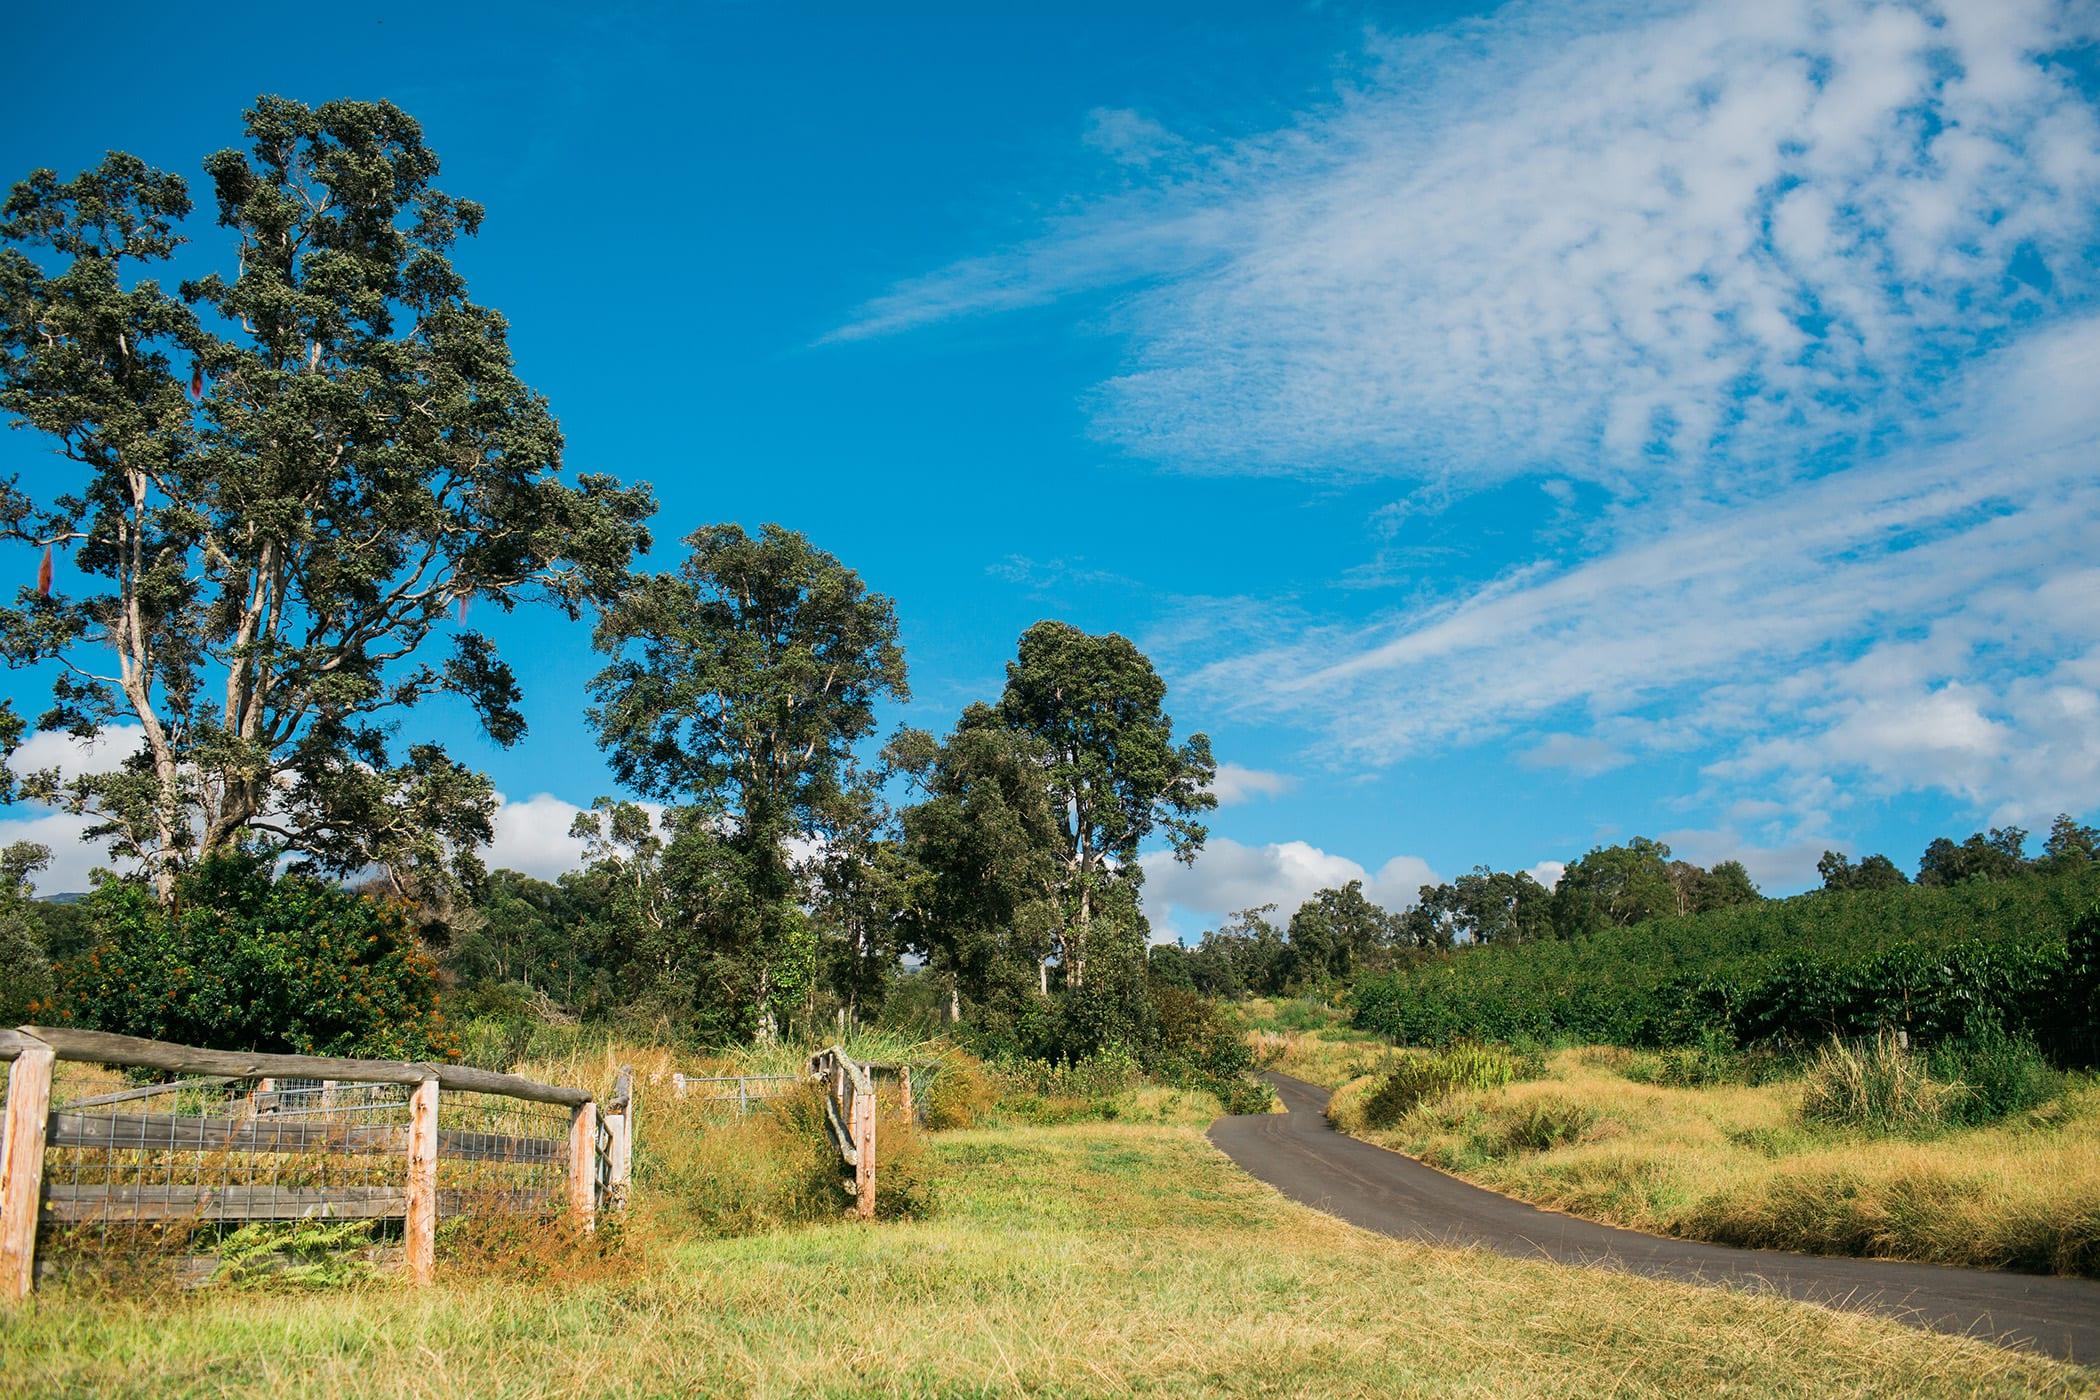 Sunshower-Farms-About-The-Farm-Tour.jpg